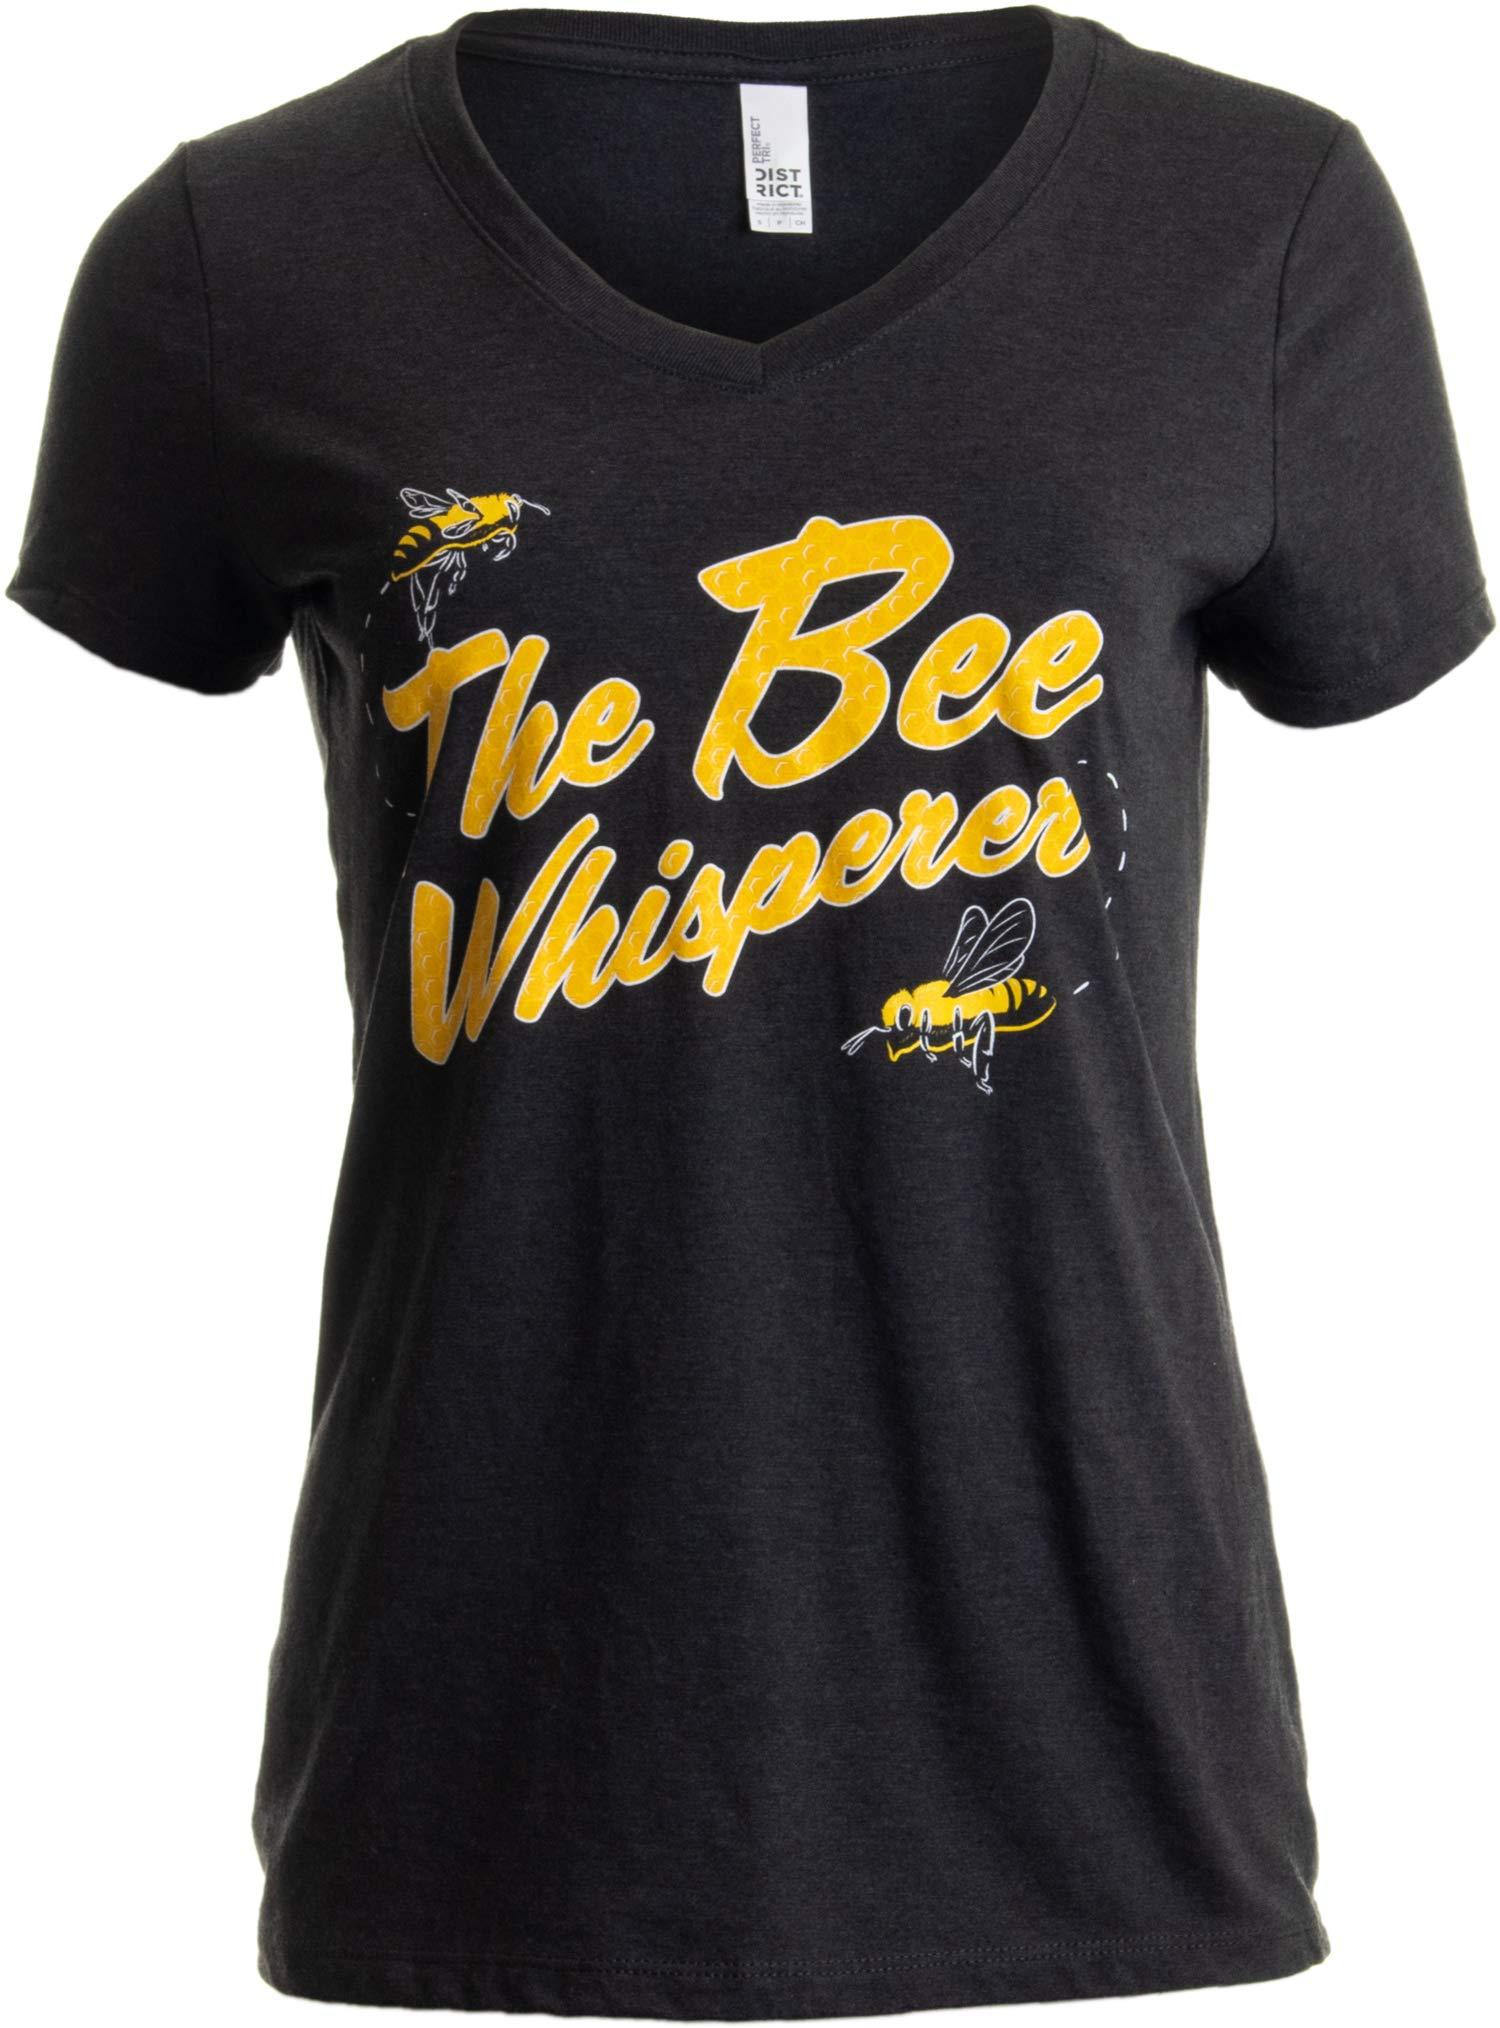 The Bee Whisperer Beekeeper Beekeeping Keeper Keeping For 1255 Shirts